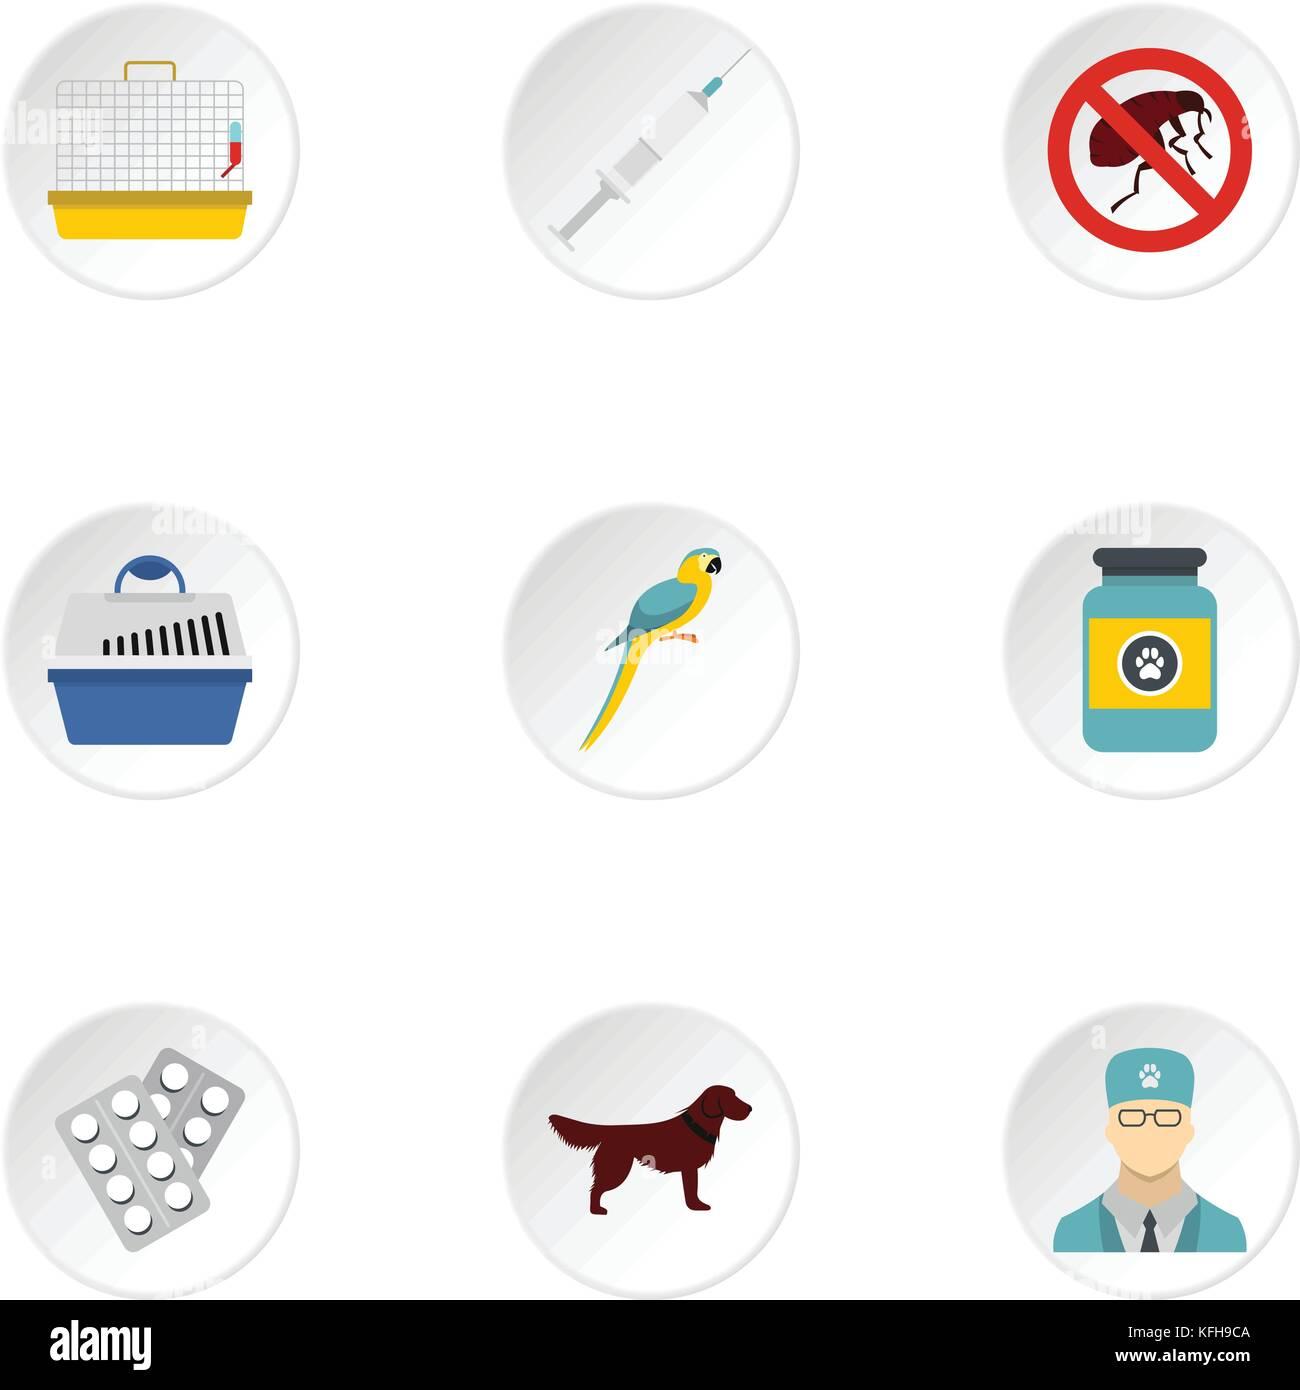 Veterinary icons set, flat style - Stock Vector